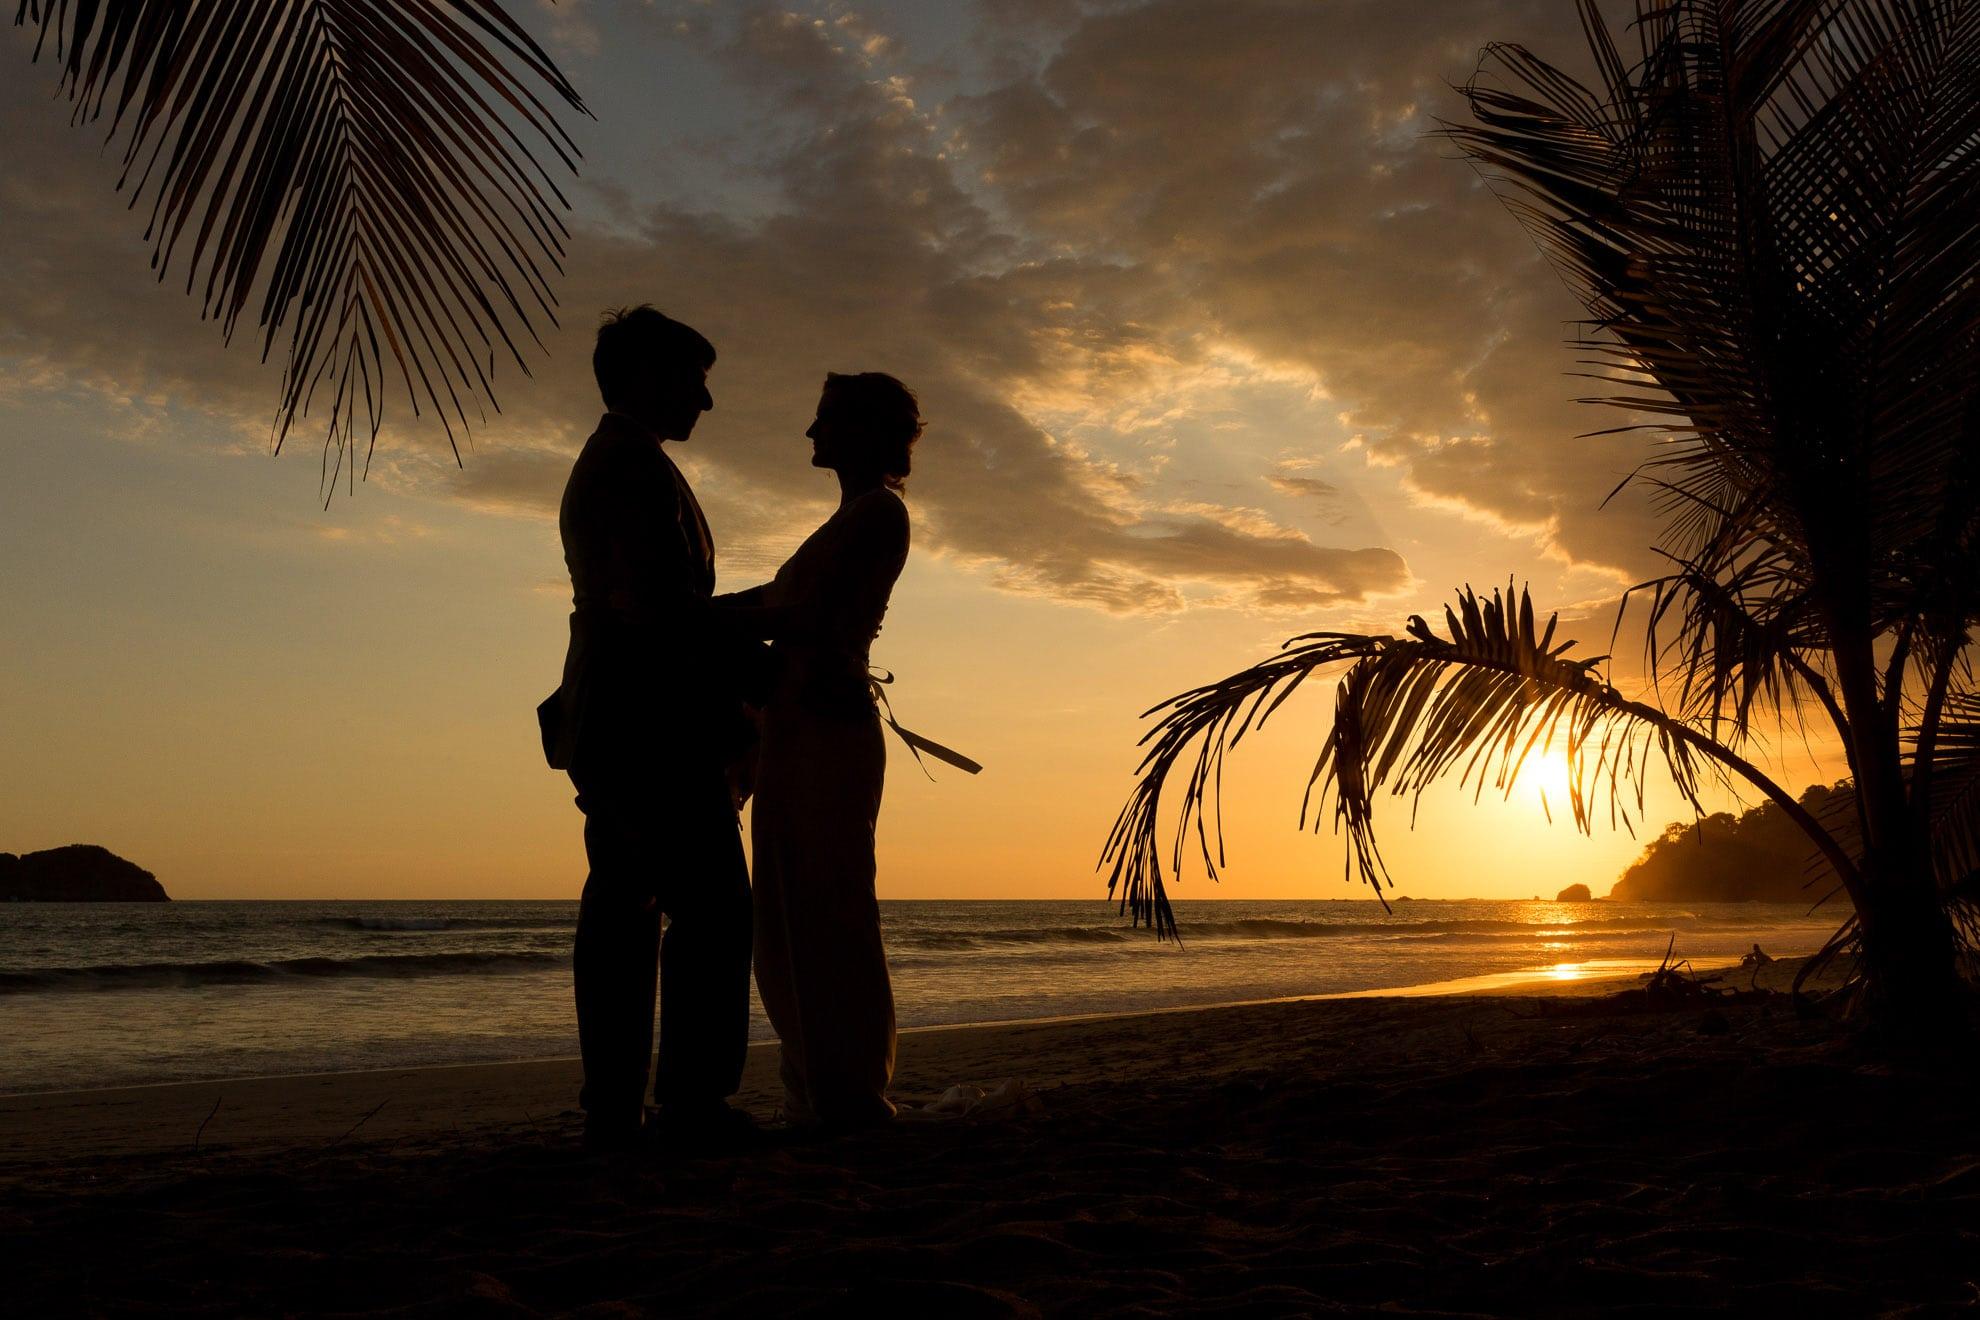 sunset silhouette on manuel antonio beach